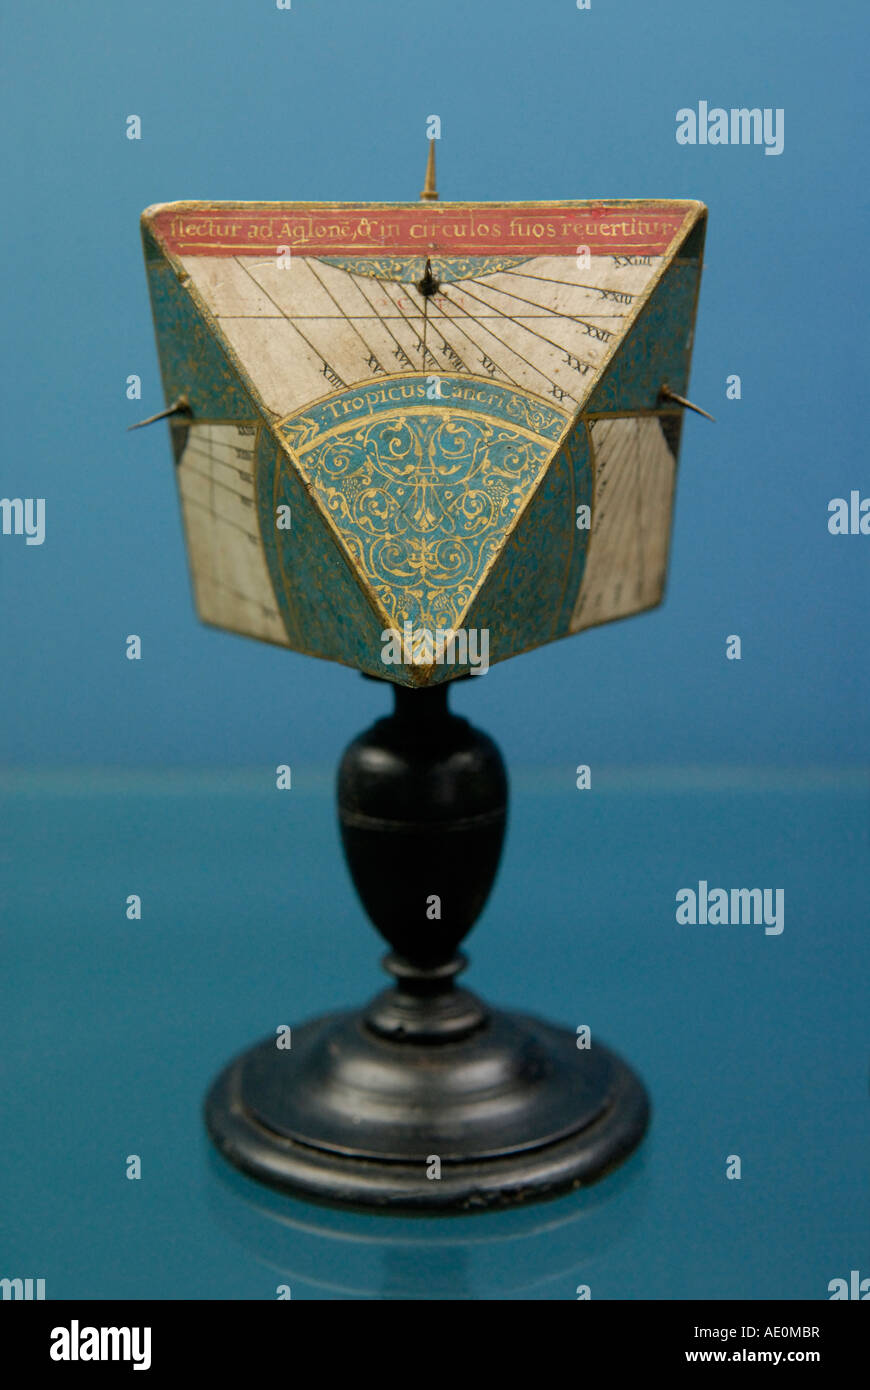 Renaissance antique sundial - Stock Image